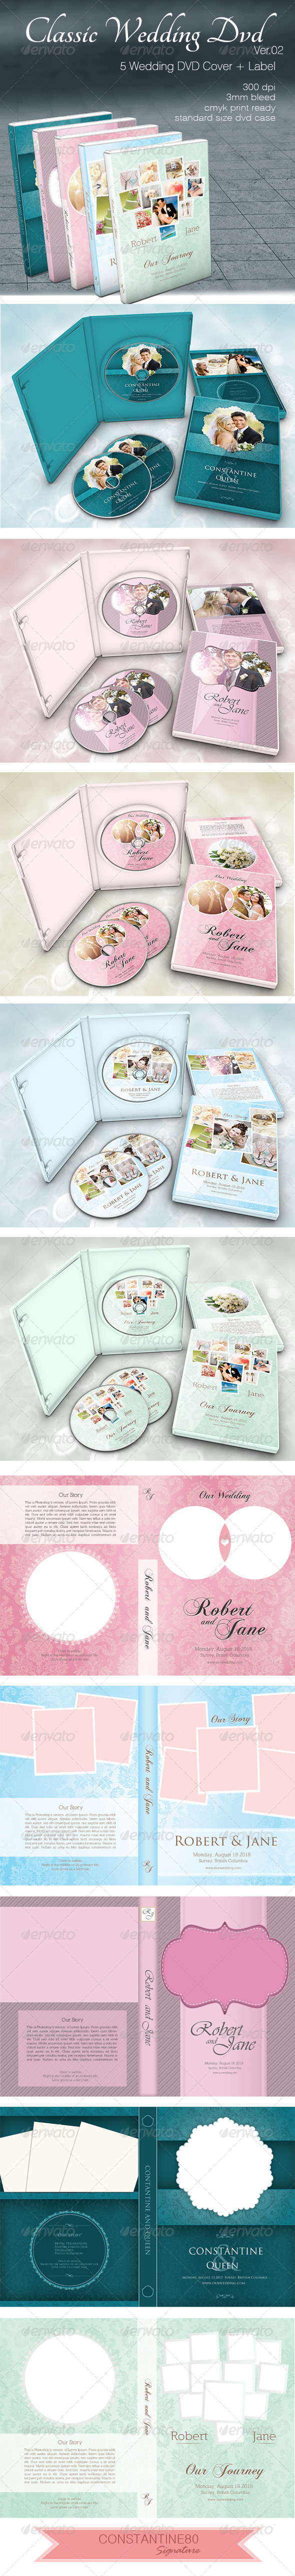 GraphicRiver Classic Wedding Dvd ver02 5115994